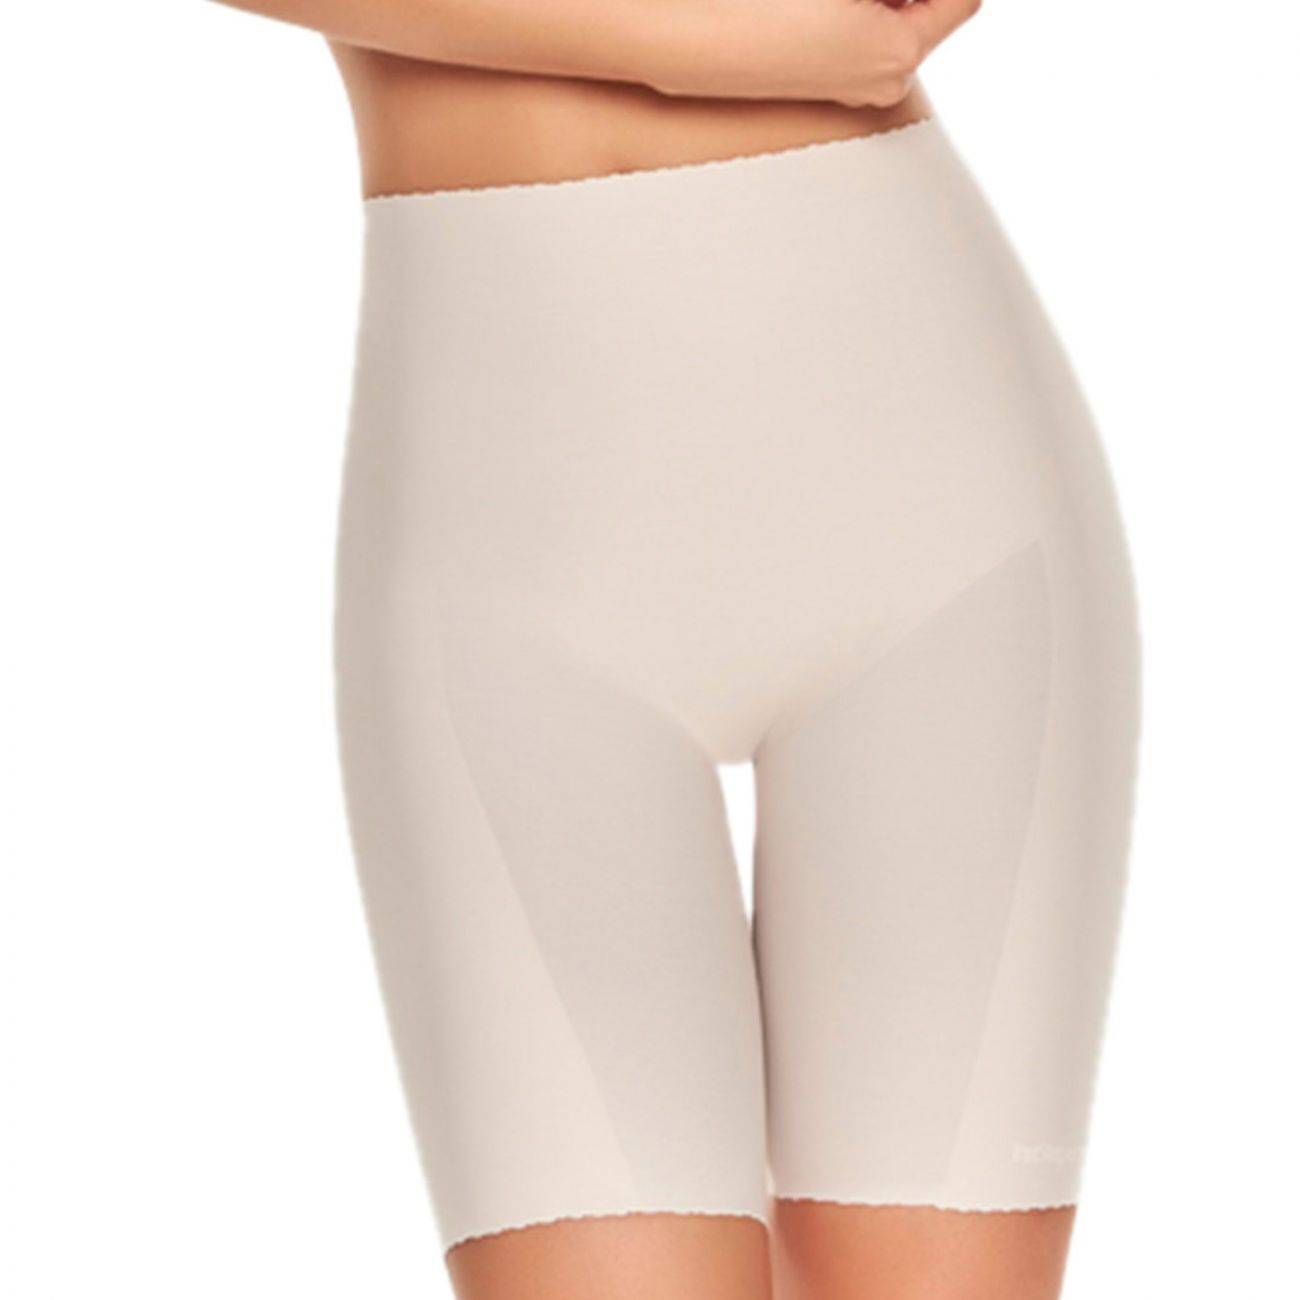 aae6a9de9e Shapewear for Women  TrueShapers 1271 Mid-Thigh Invisible Shaper Short